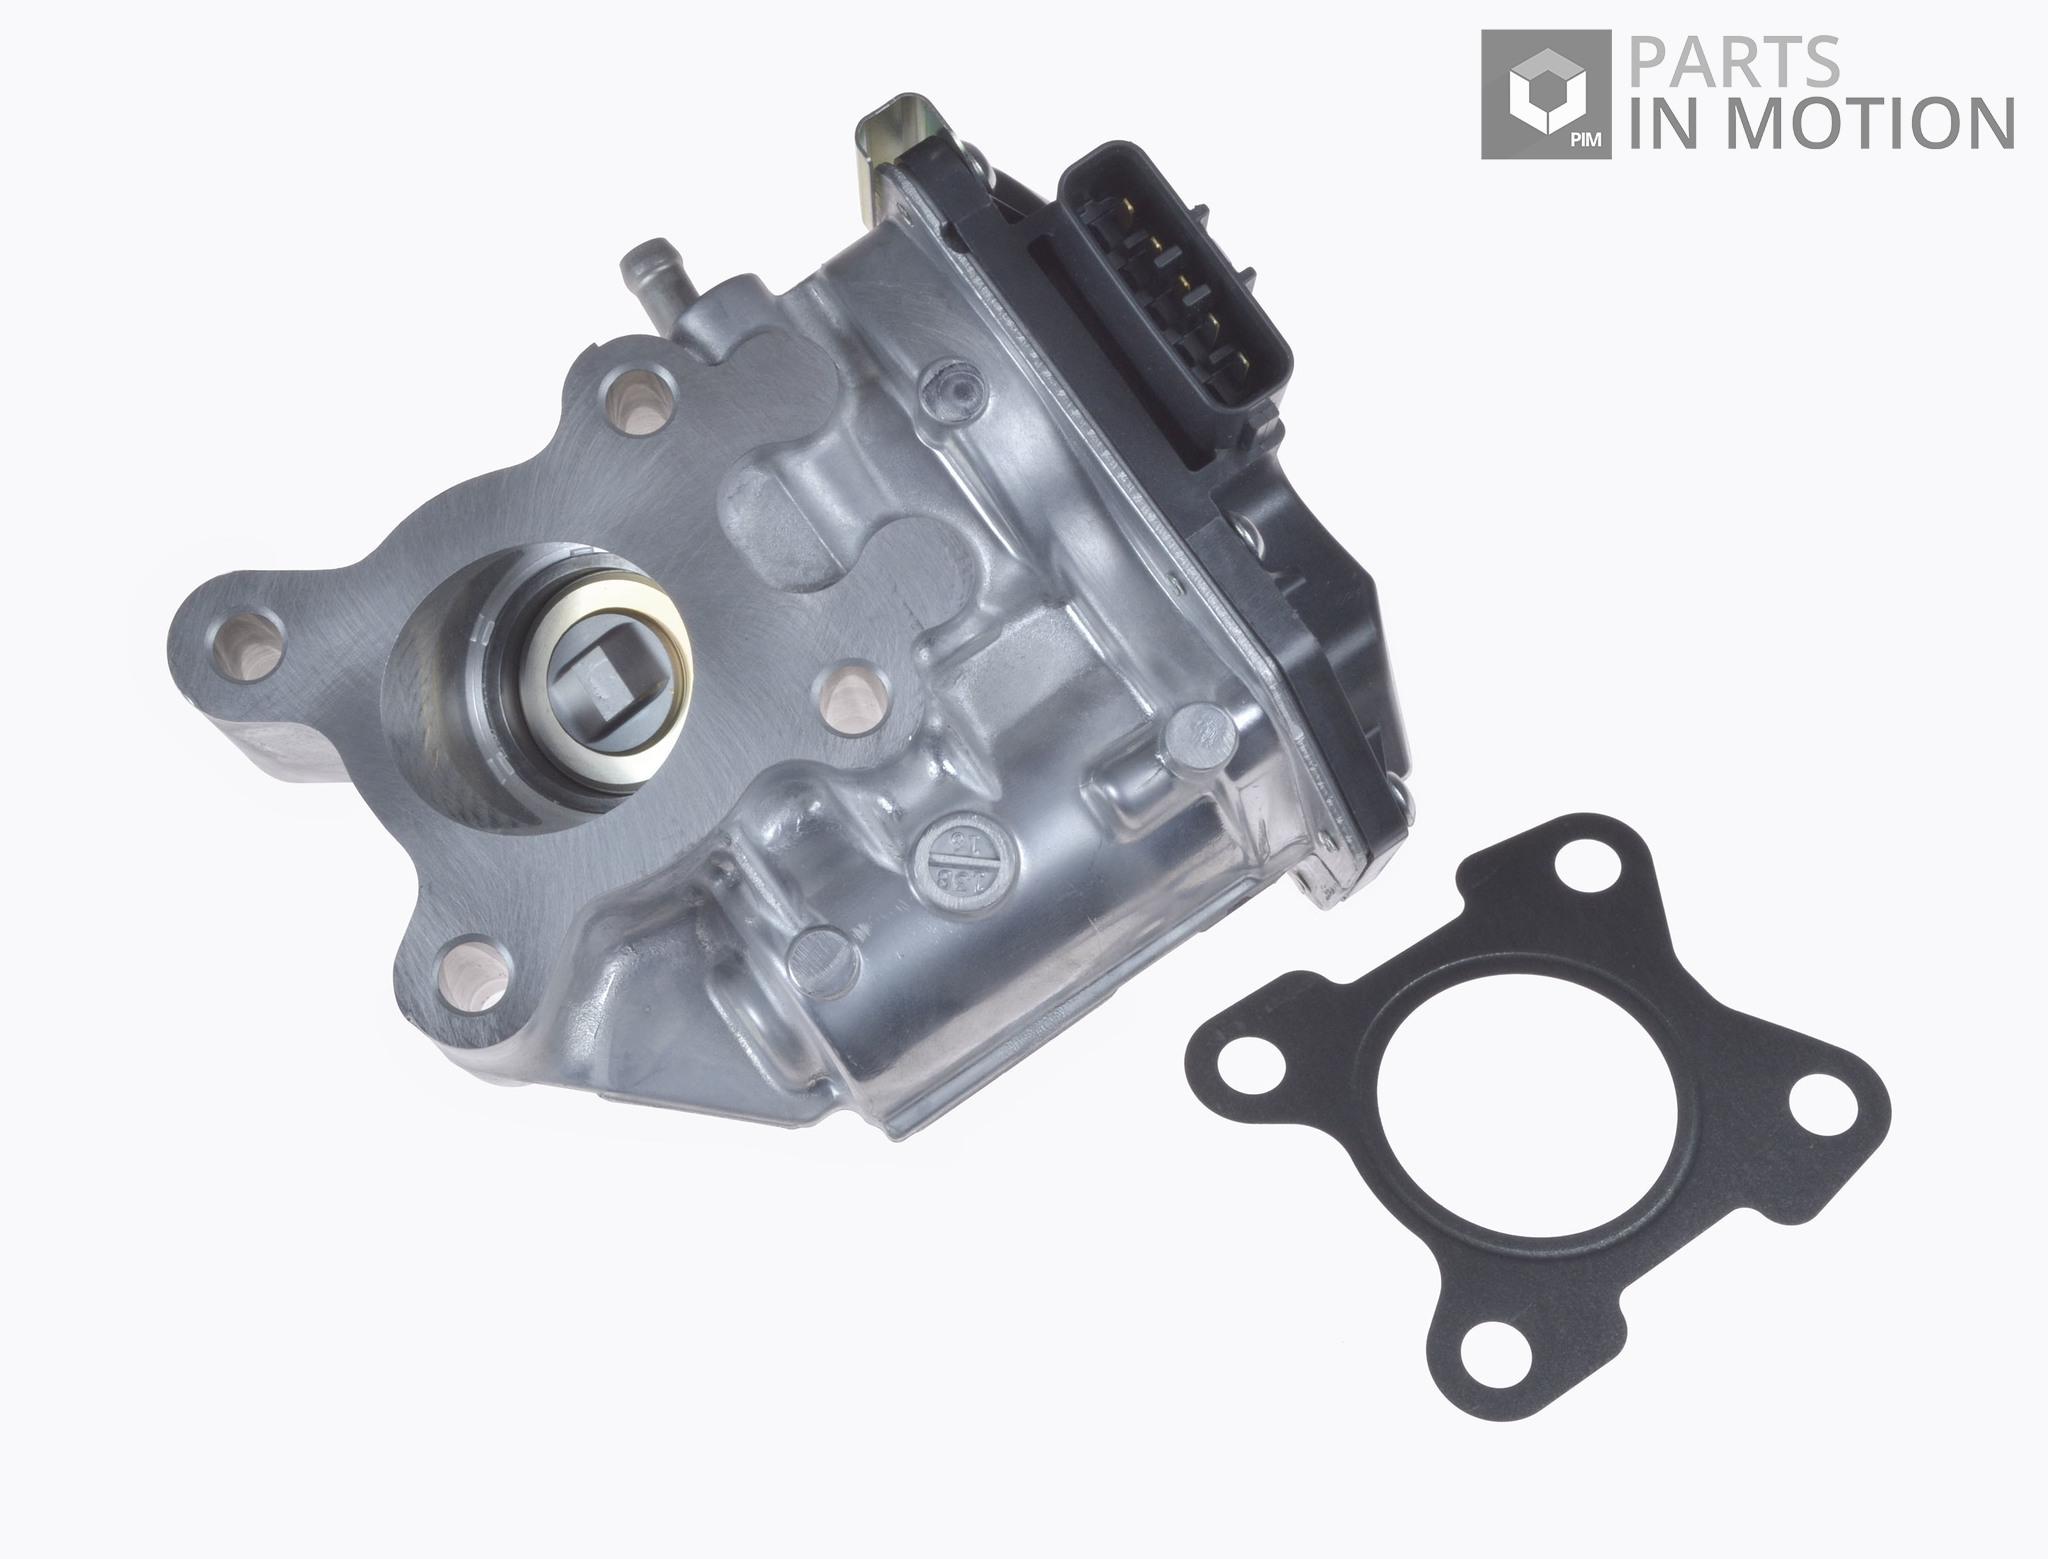 Egr valve adn17233 blue print 147105x00a 147105x00d 147105x00c blue print egr valve adn17233 malvernweather Choice Image